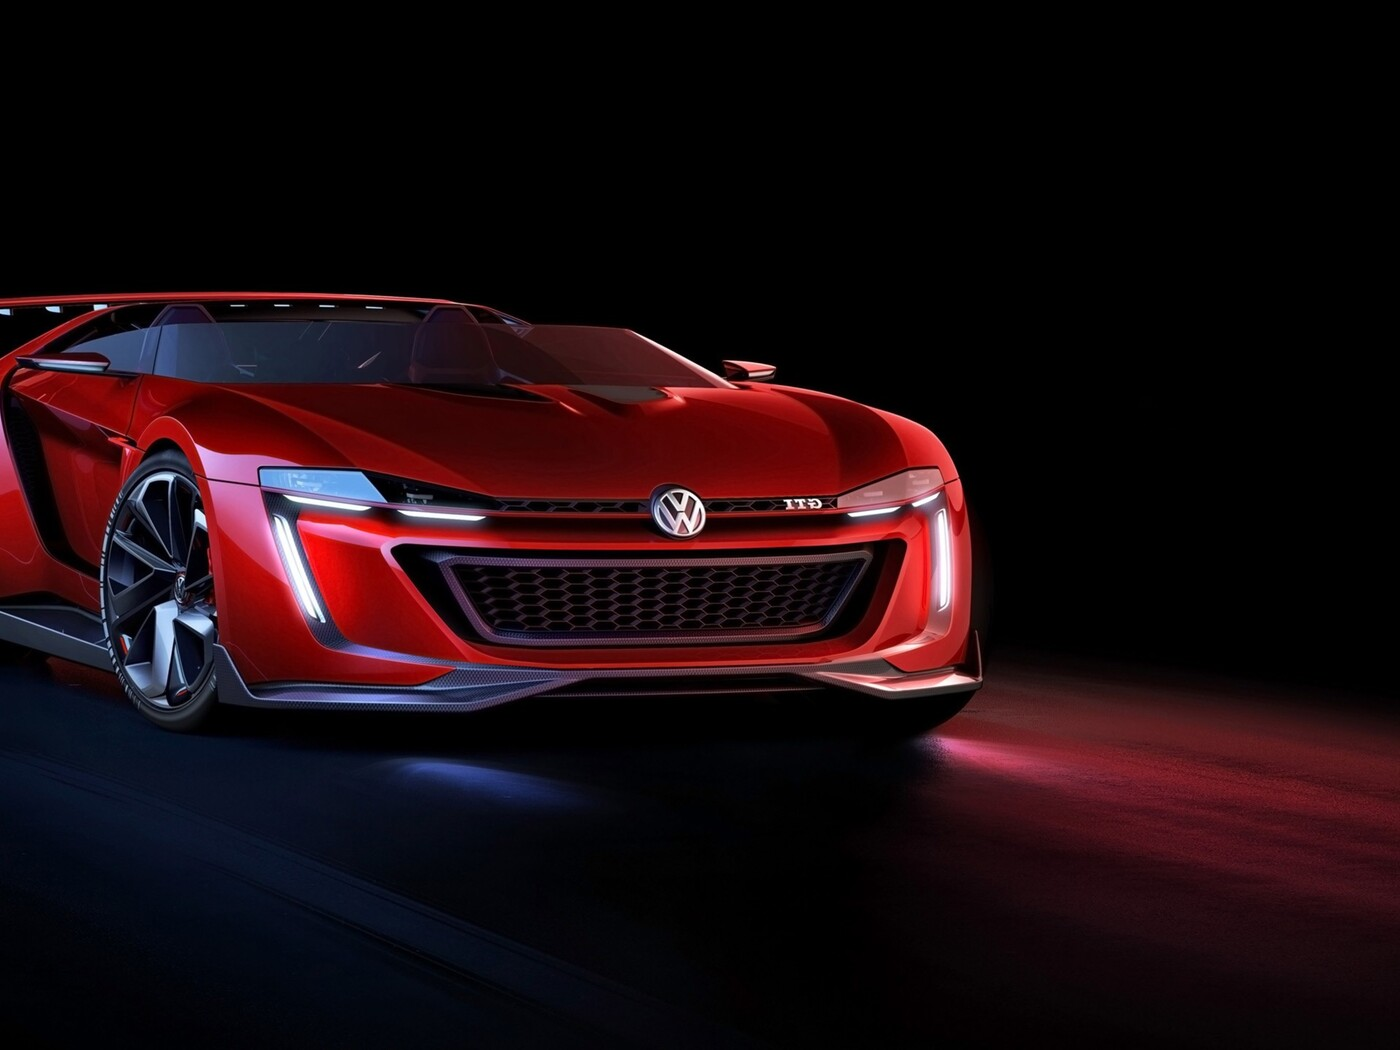 volkswagen-gti-roadster.jpg